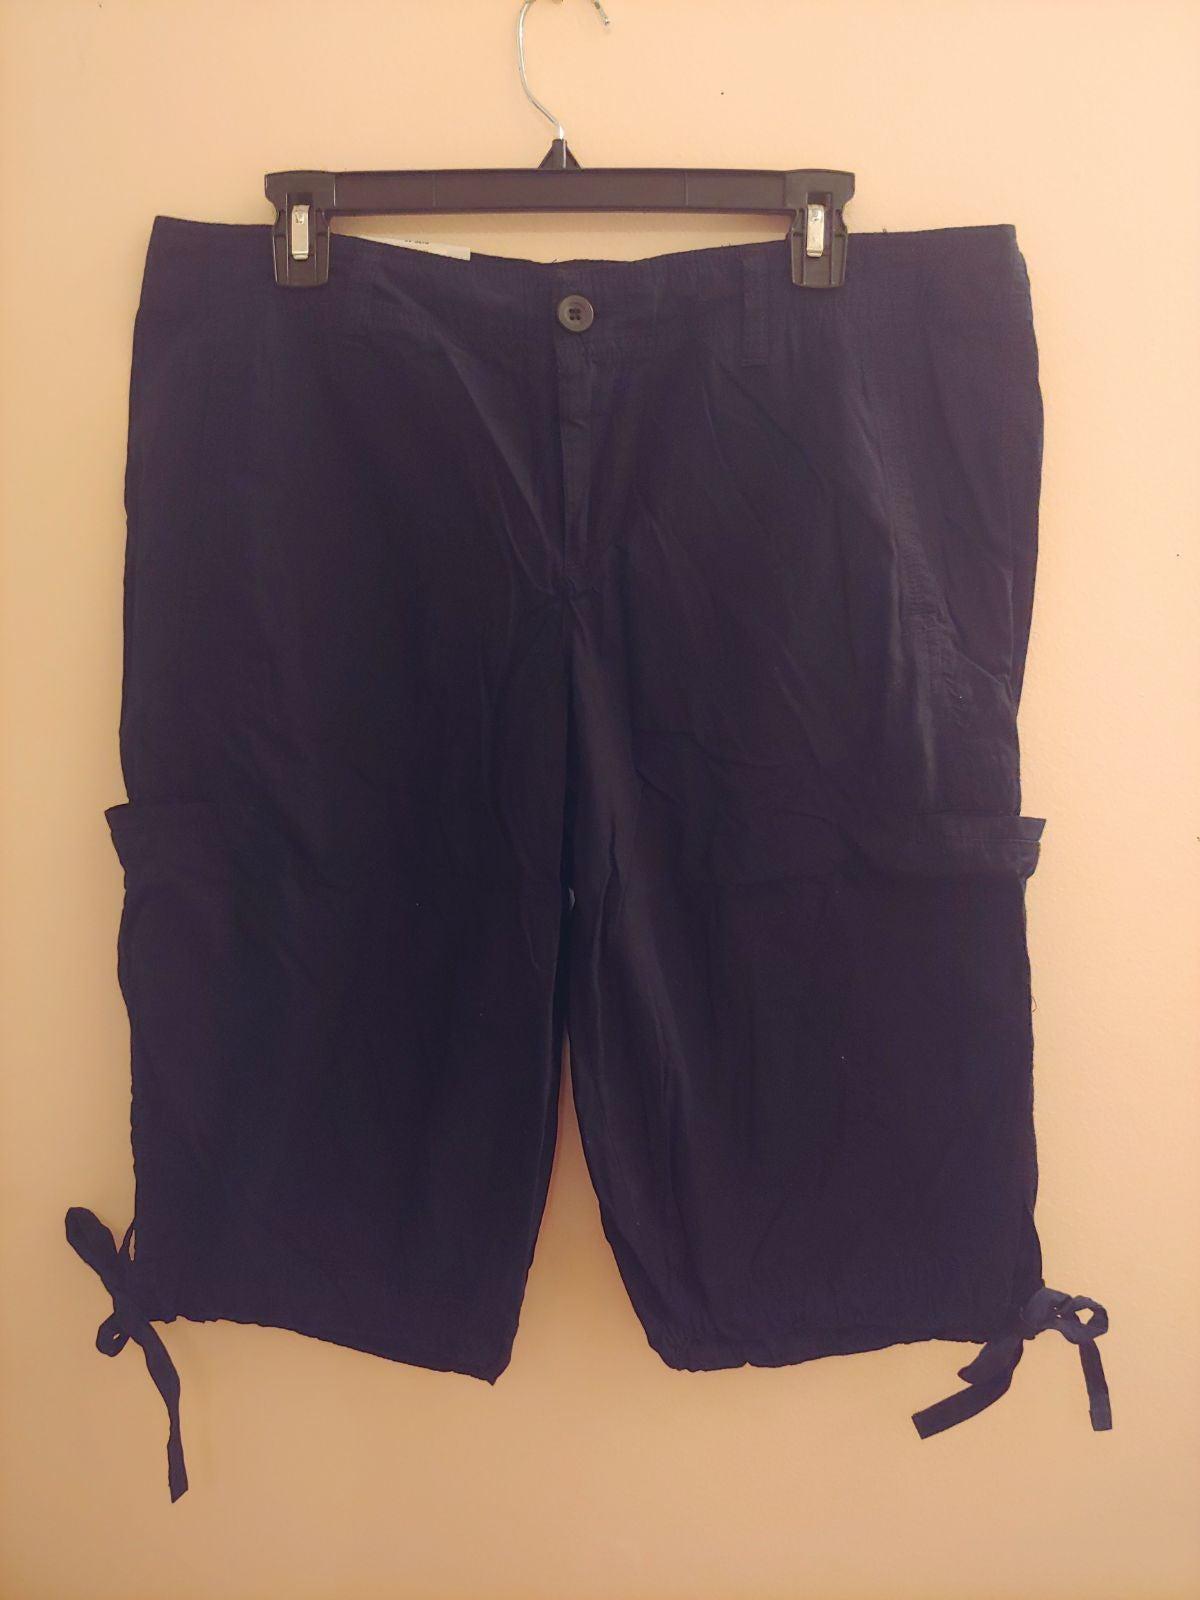 Crew Shorts, NWT